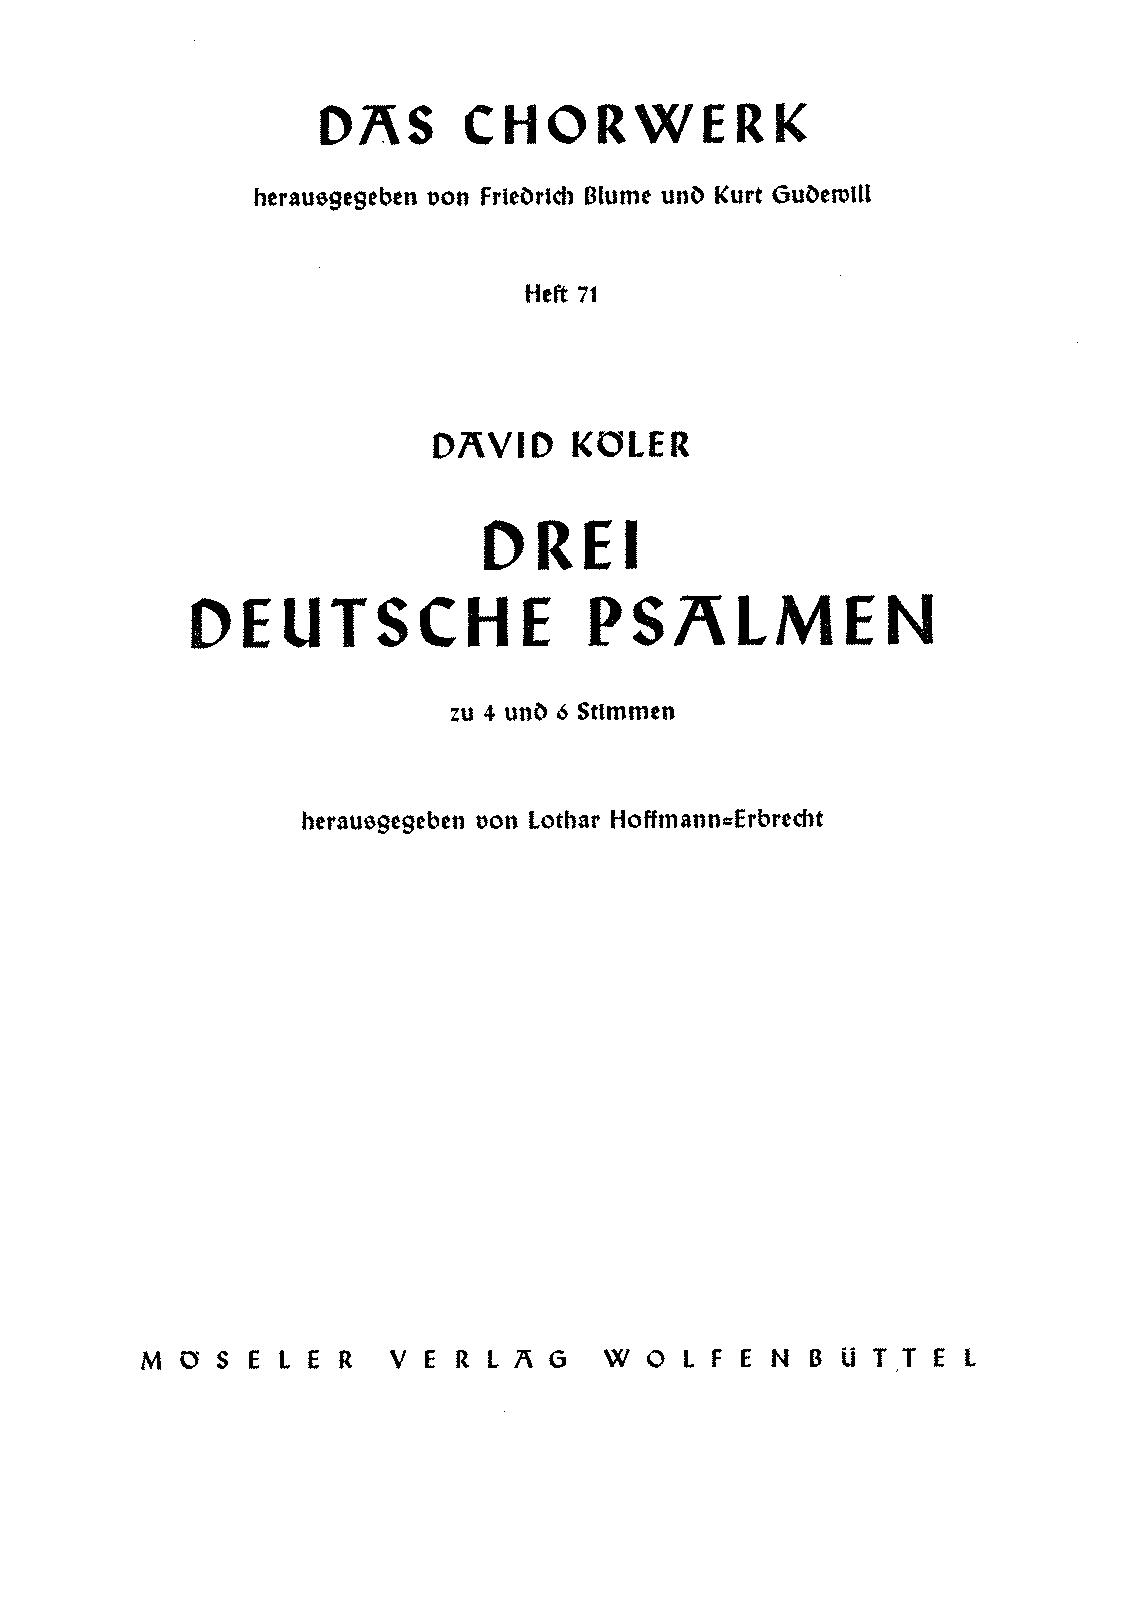 3 German Psalms (Köler, David) - IMSLP/Petrucci Music Library: Free